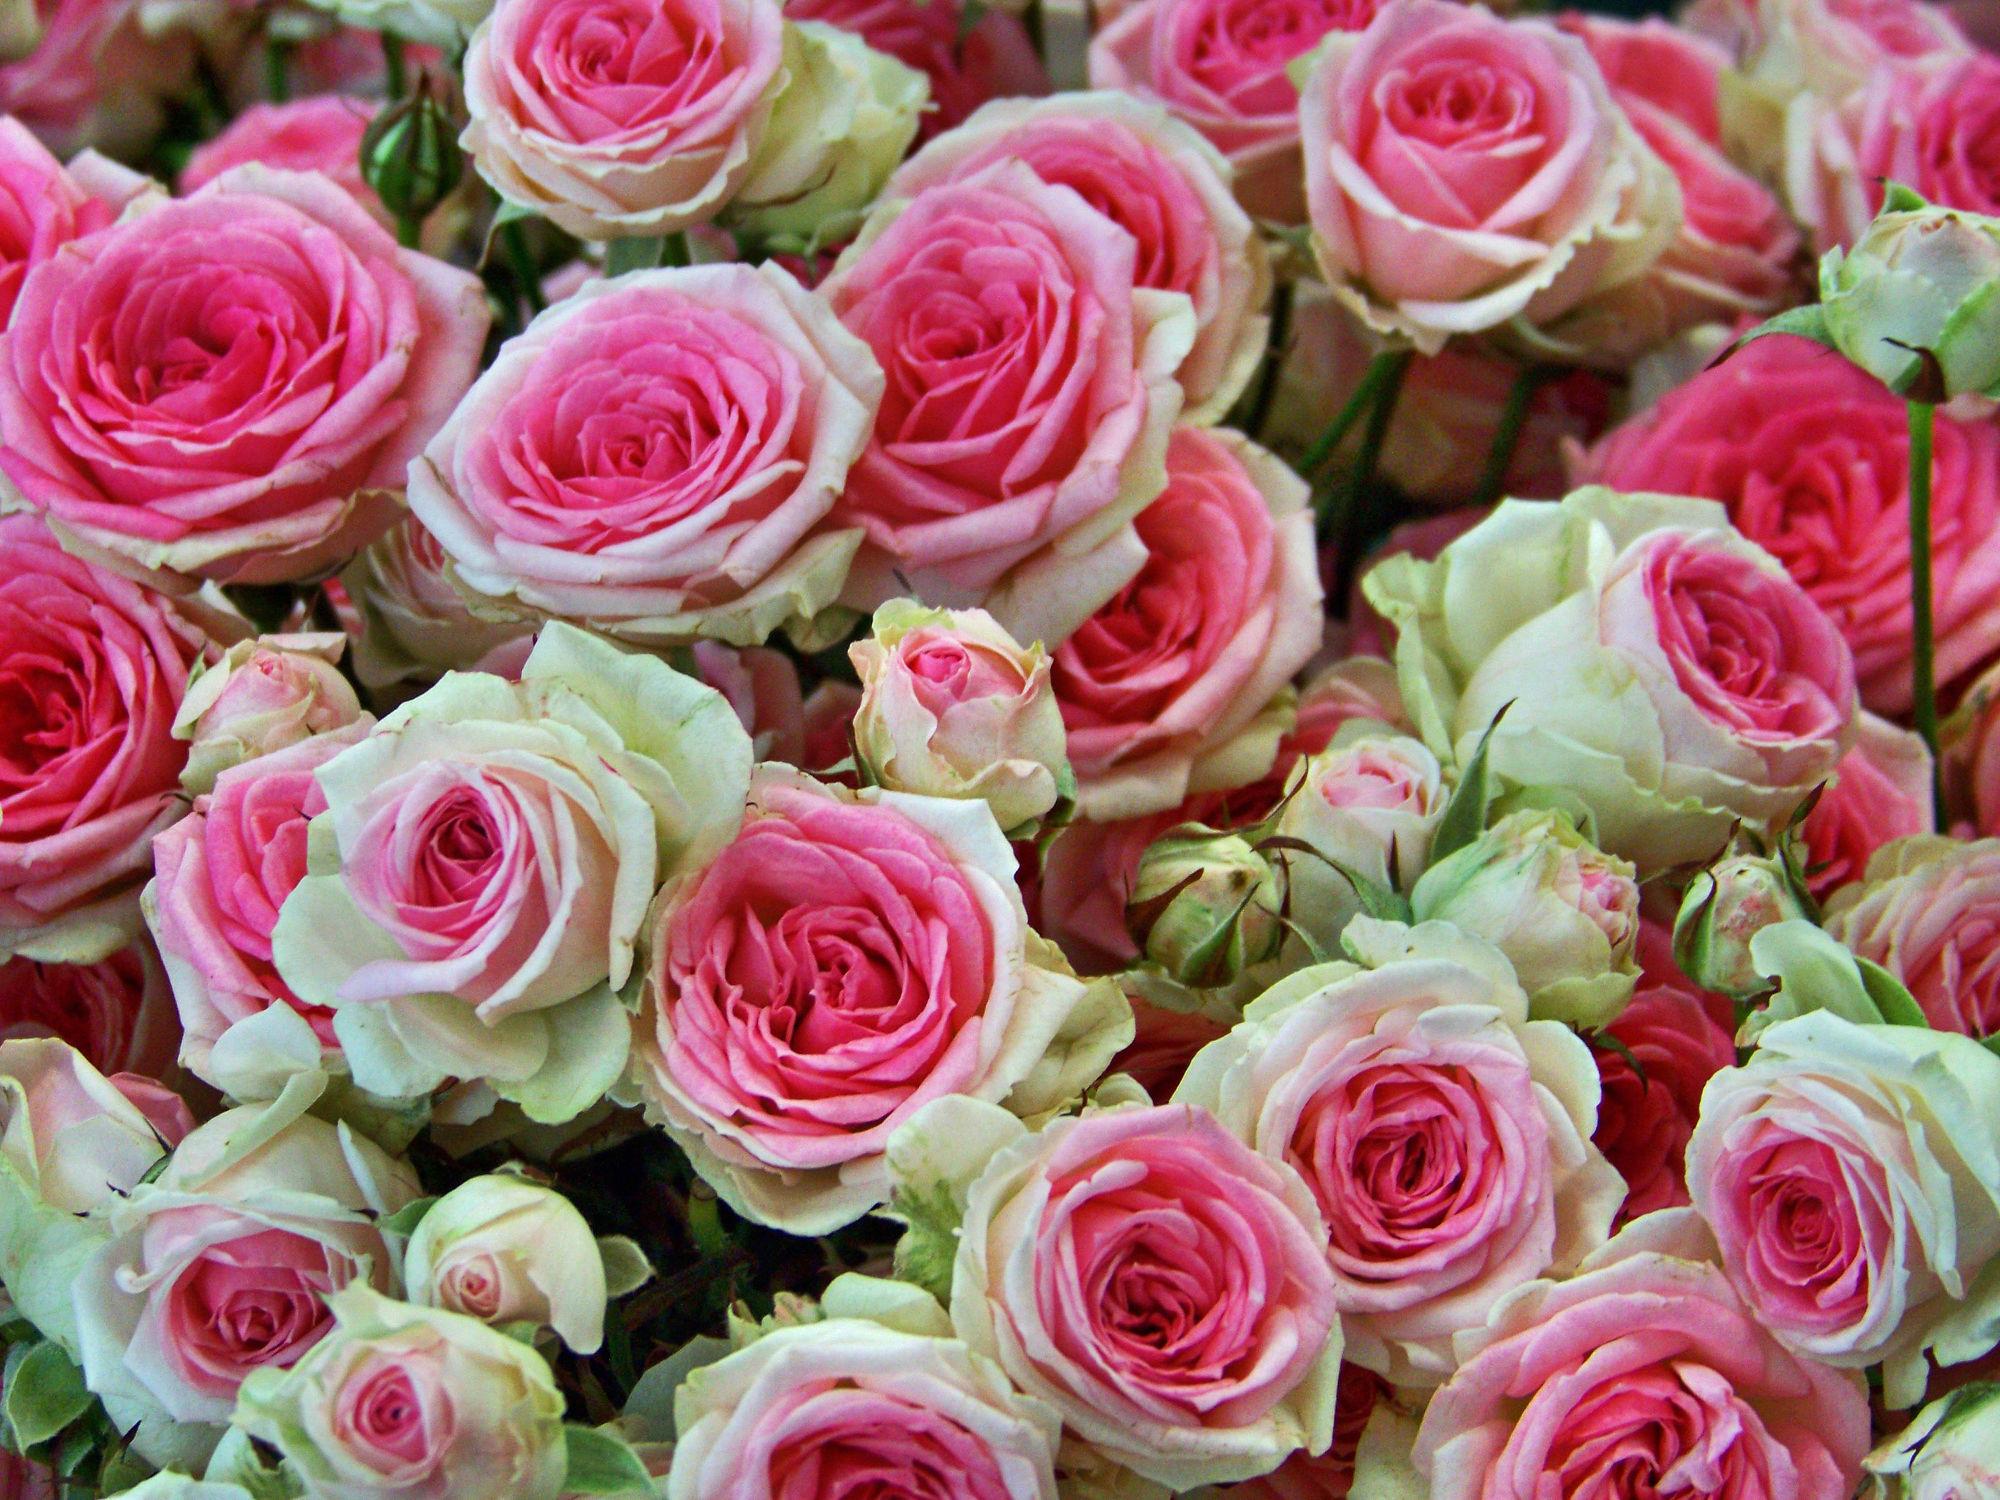 Bild mit Rosa, Rosen, Pflanze, Pflanze, Rose, romantik, Blüten, blüte, Liebe, Love, rosenblüten